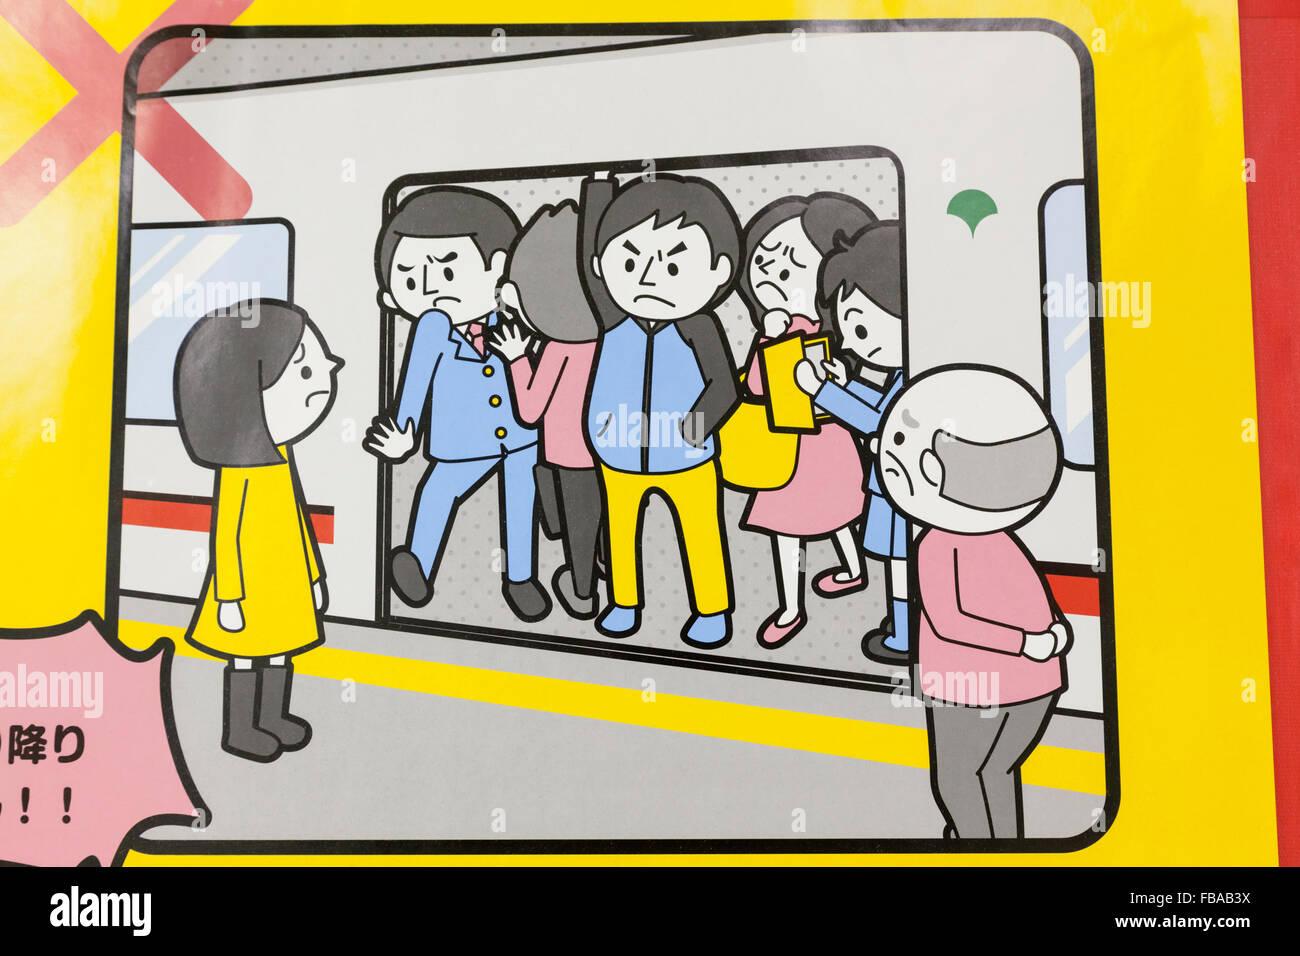 Japan, Honshu, Tokyo, Subway Social Awareness Poster - Stock Image